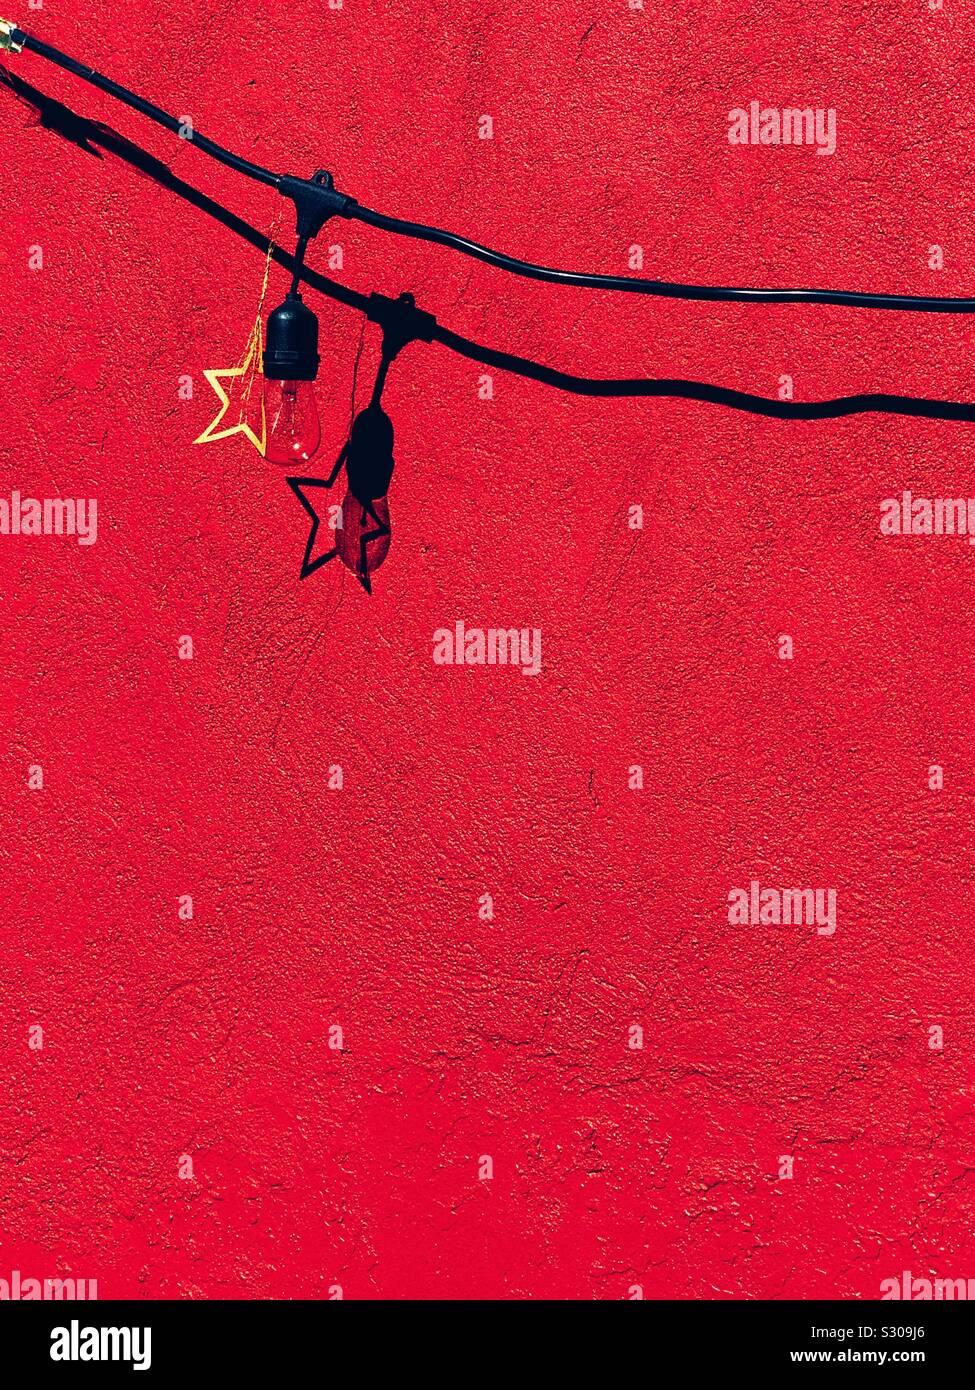 Pared roja con una estrella Foto de stock